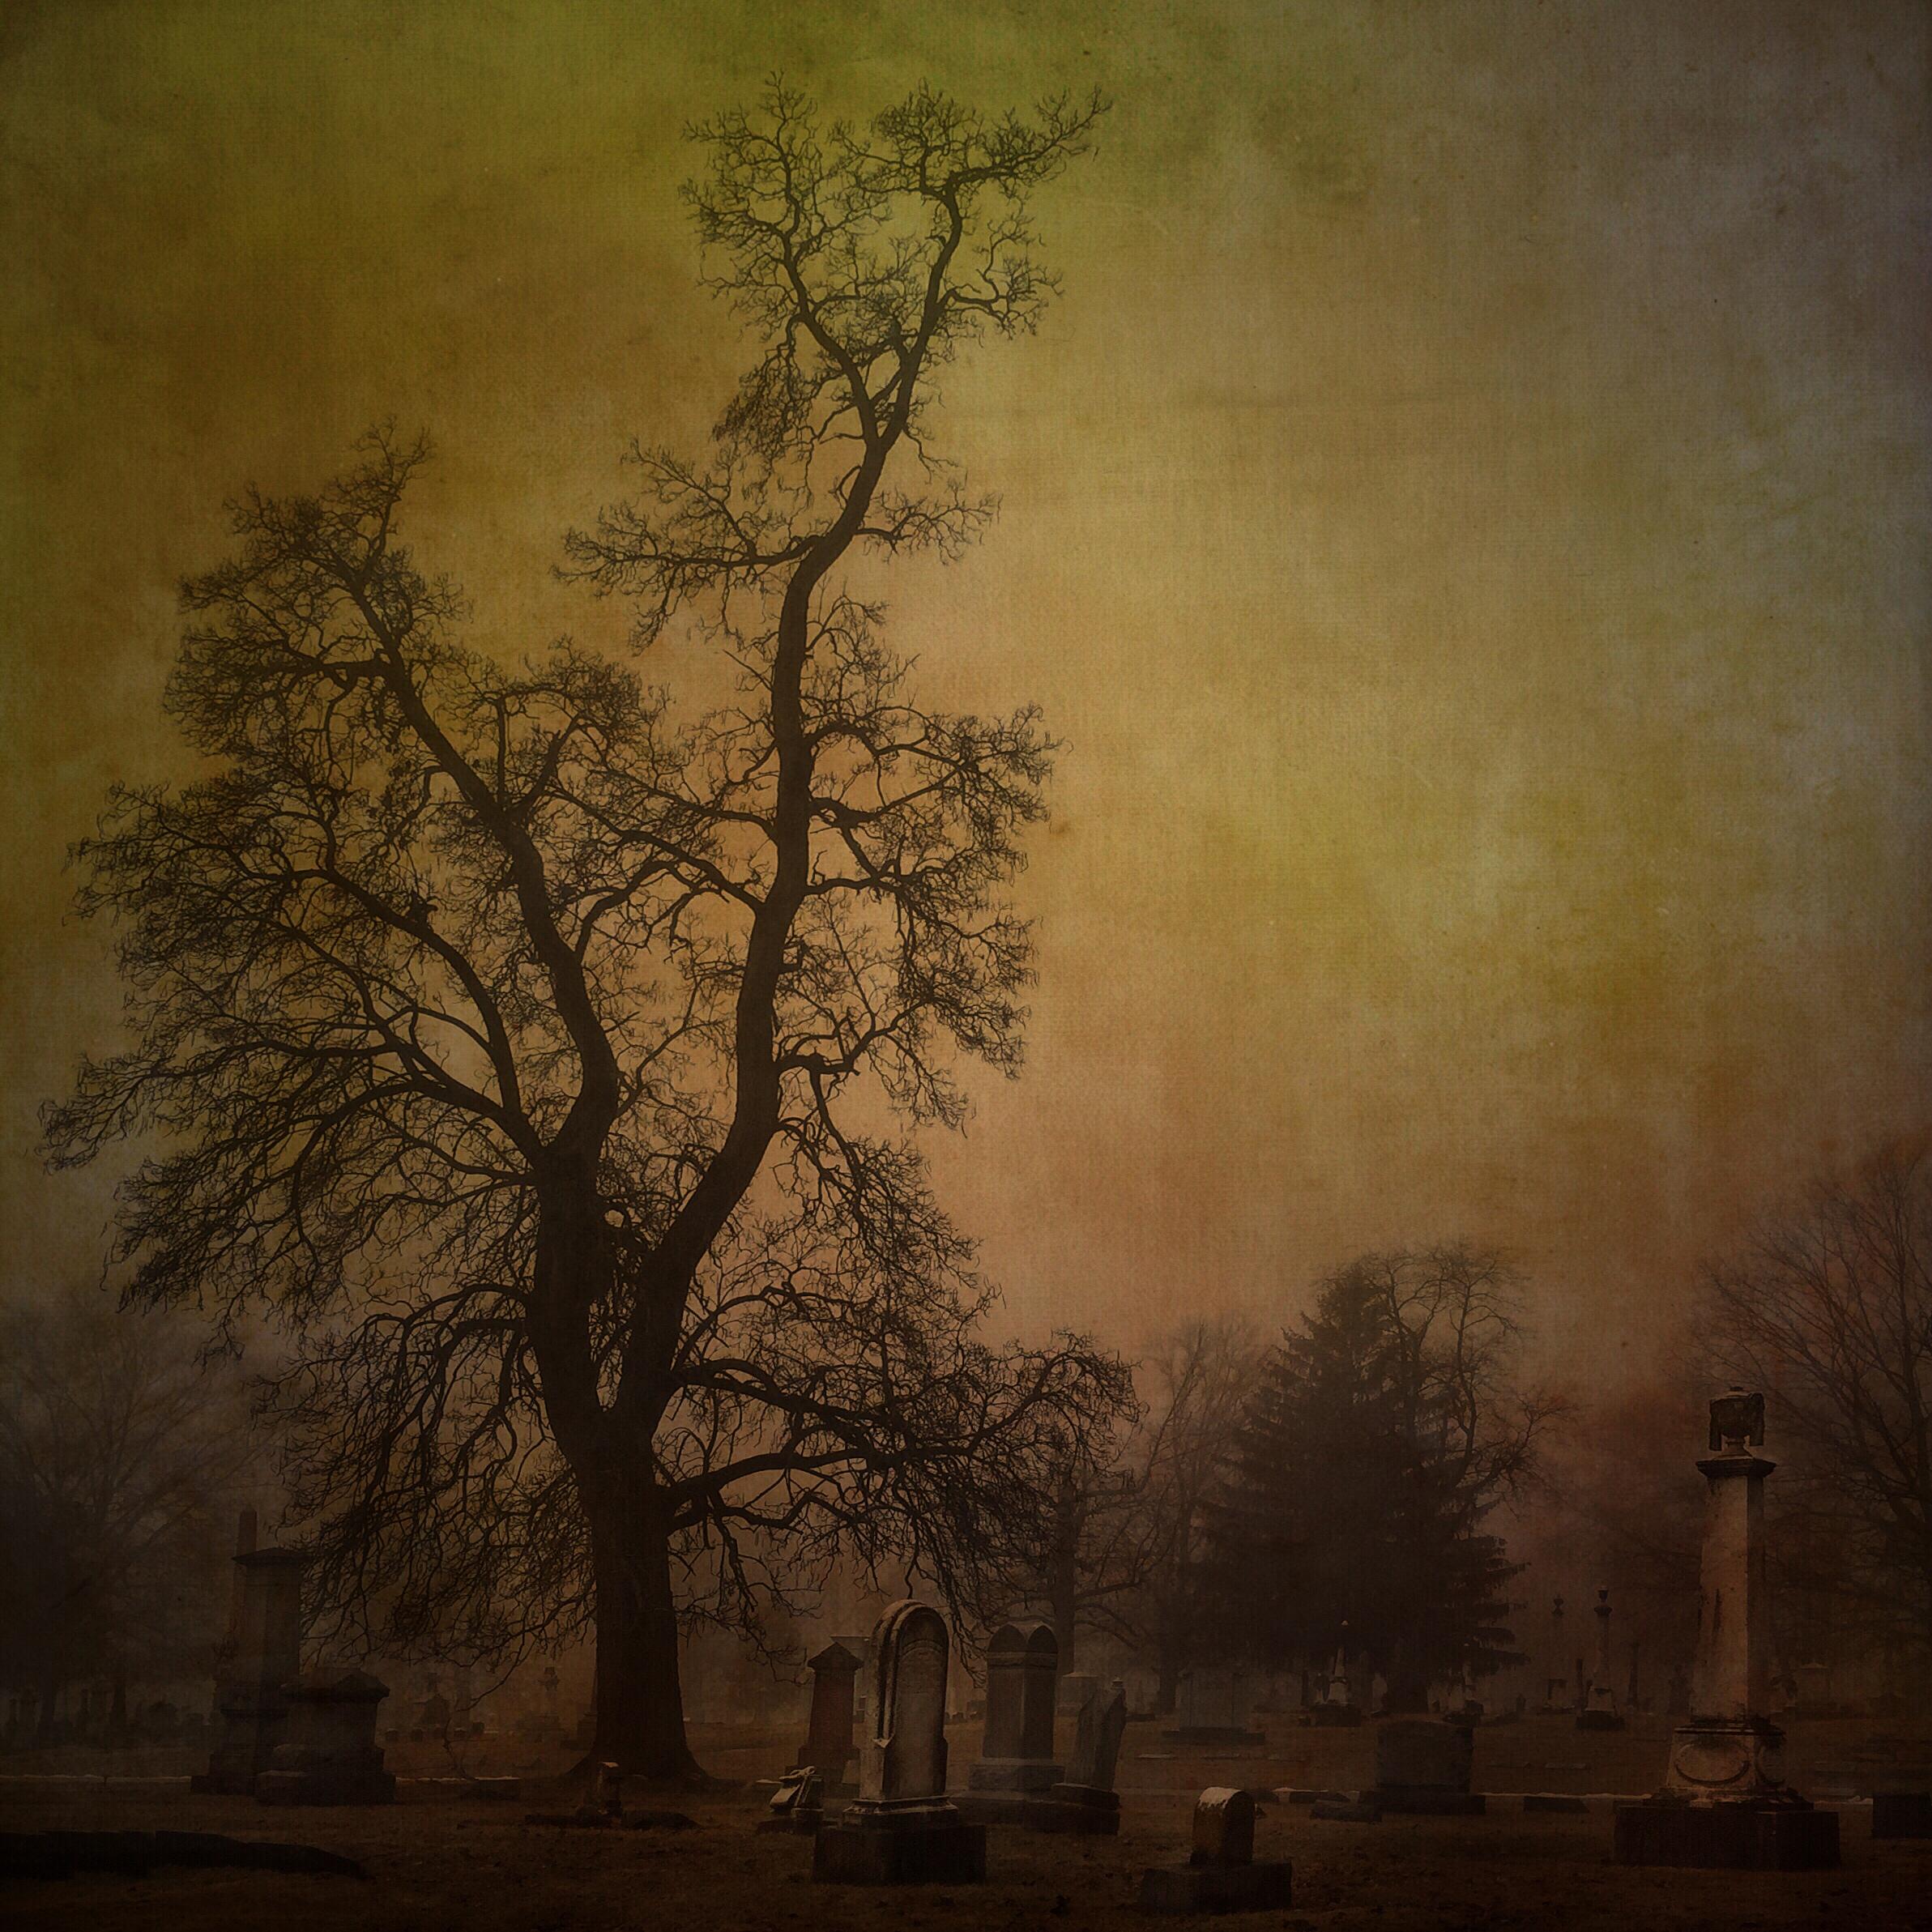 Sentinel, Crown Hill Cemetery  [Photo Credit: Rad A. Drew]